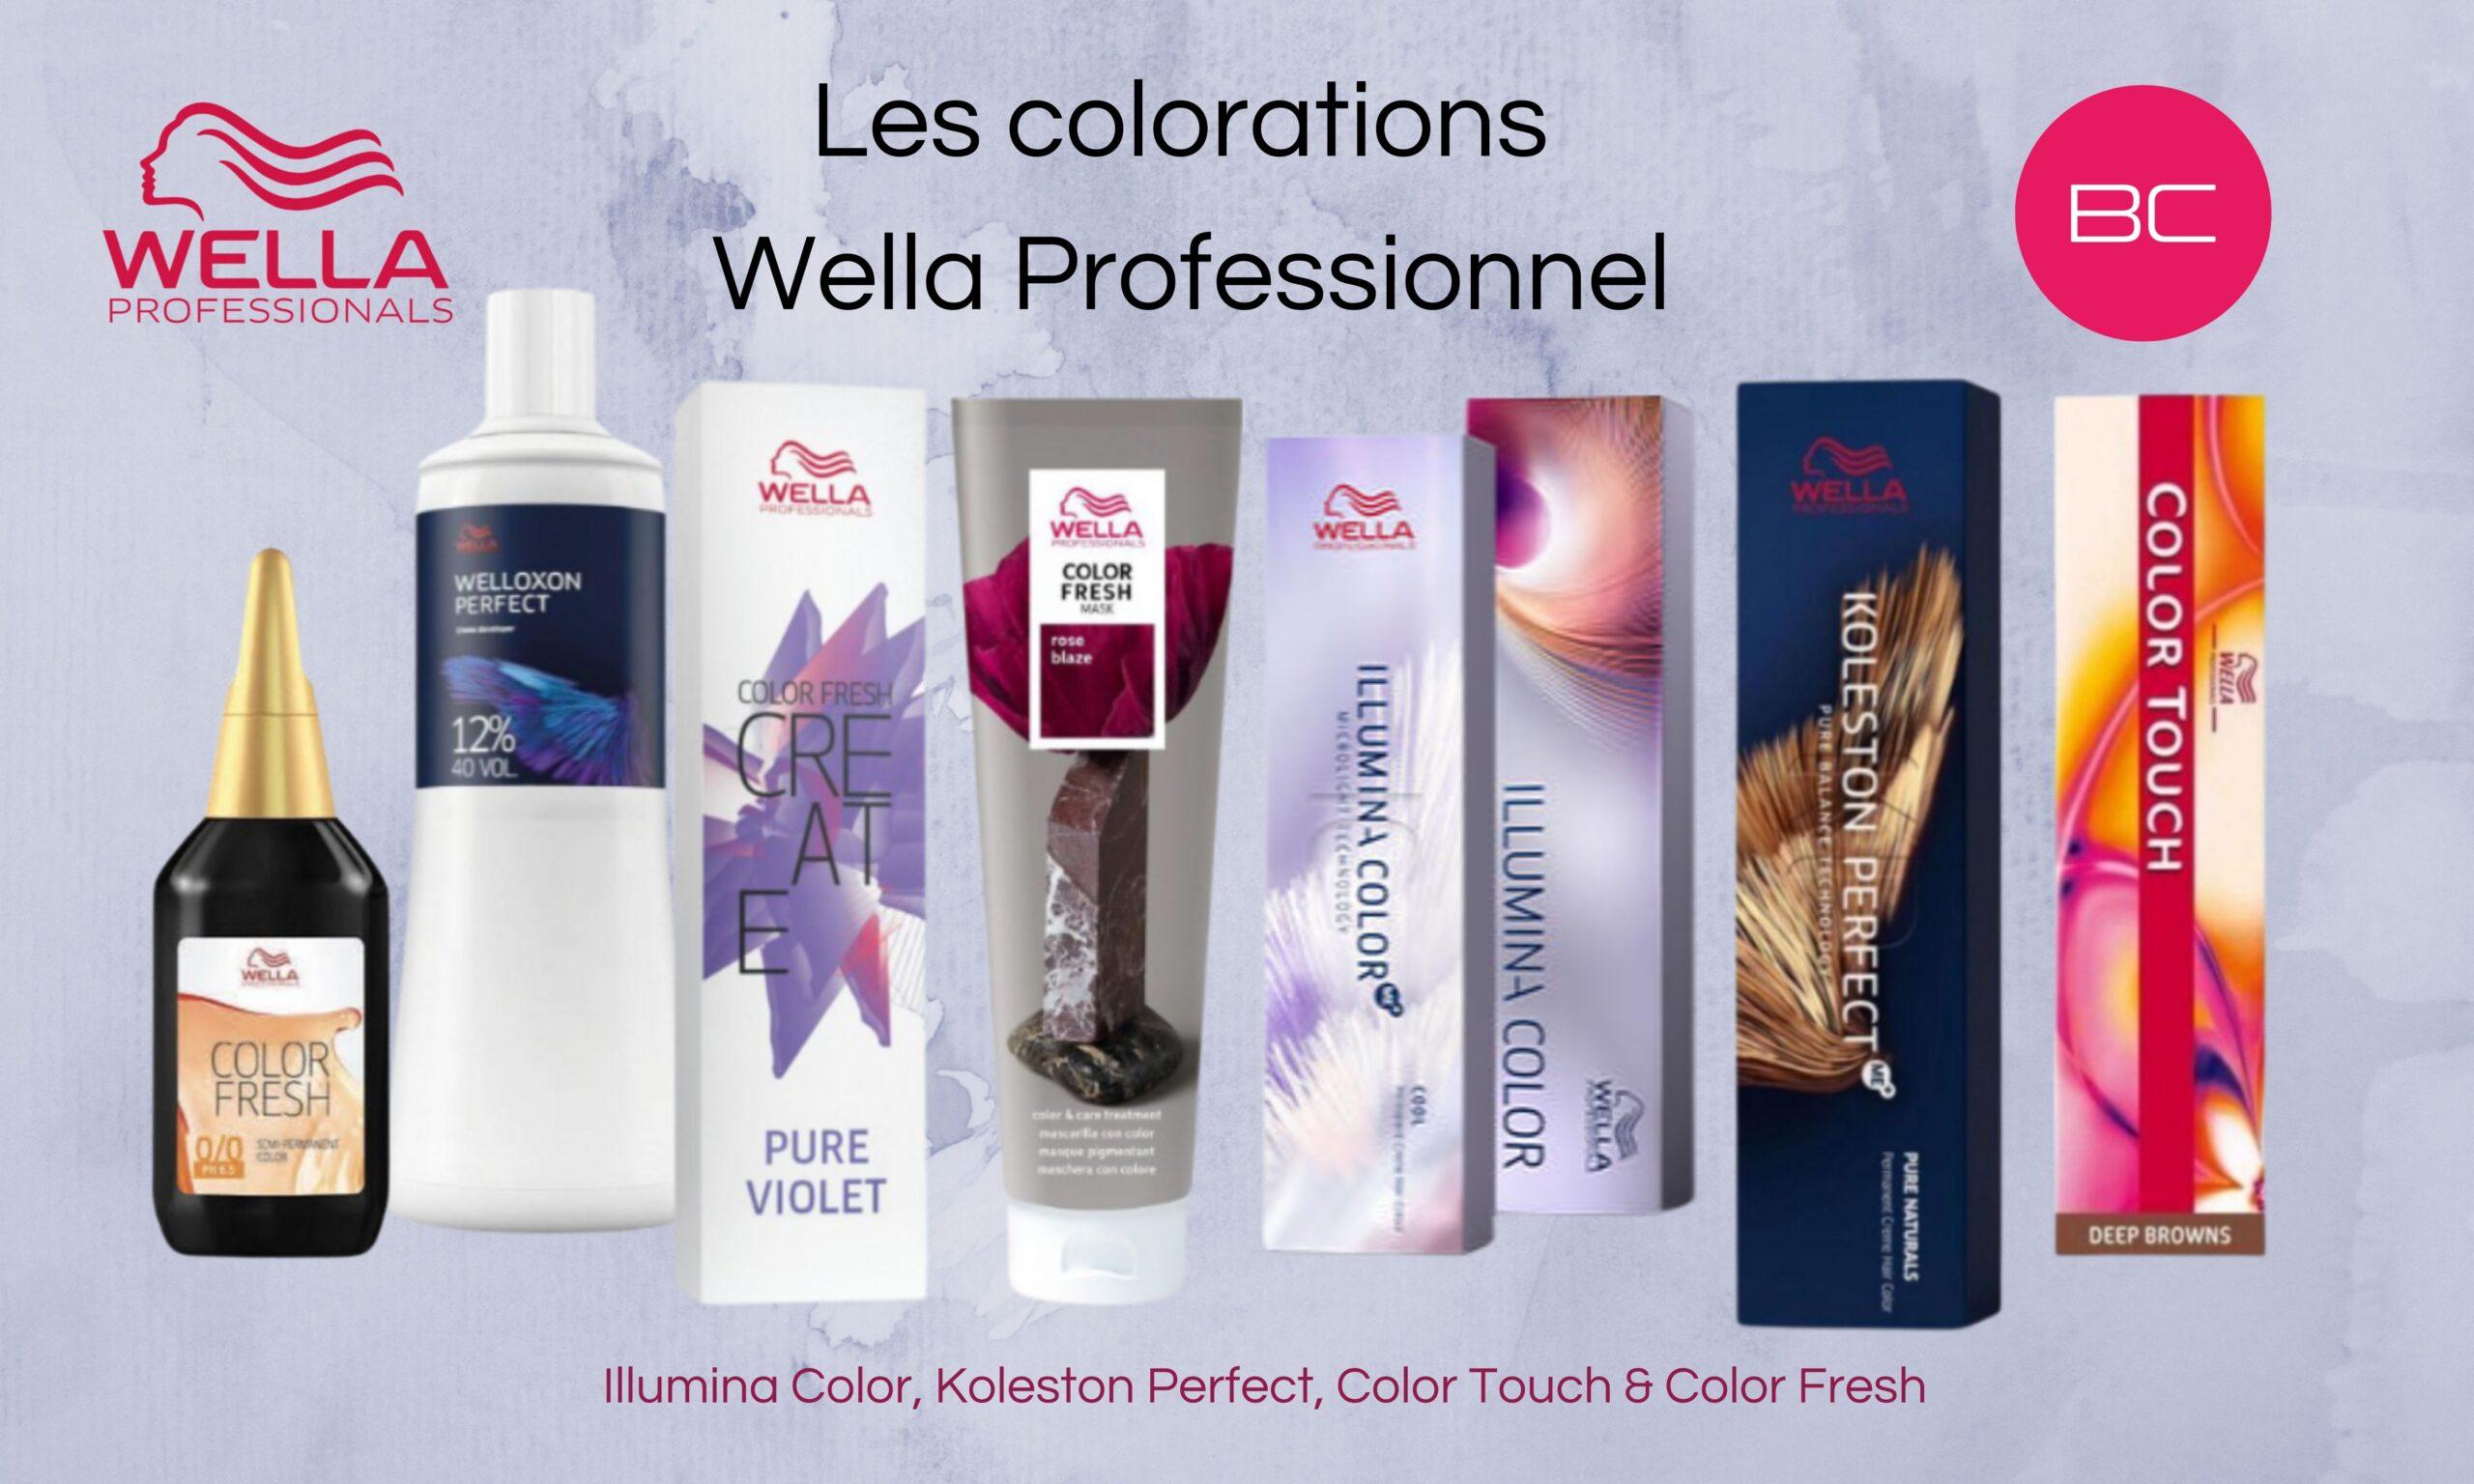 Wella Colorations